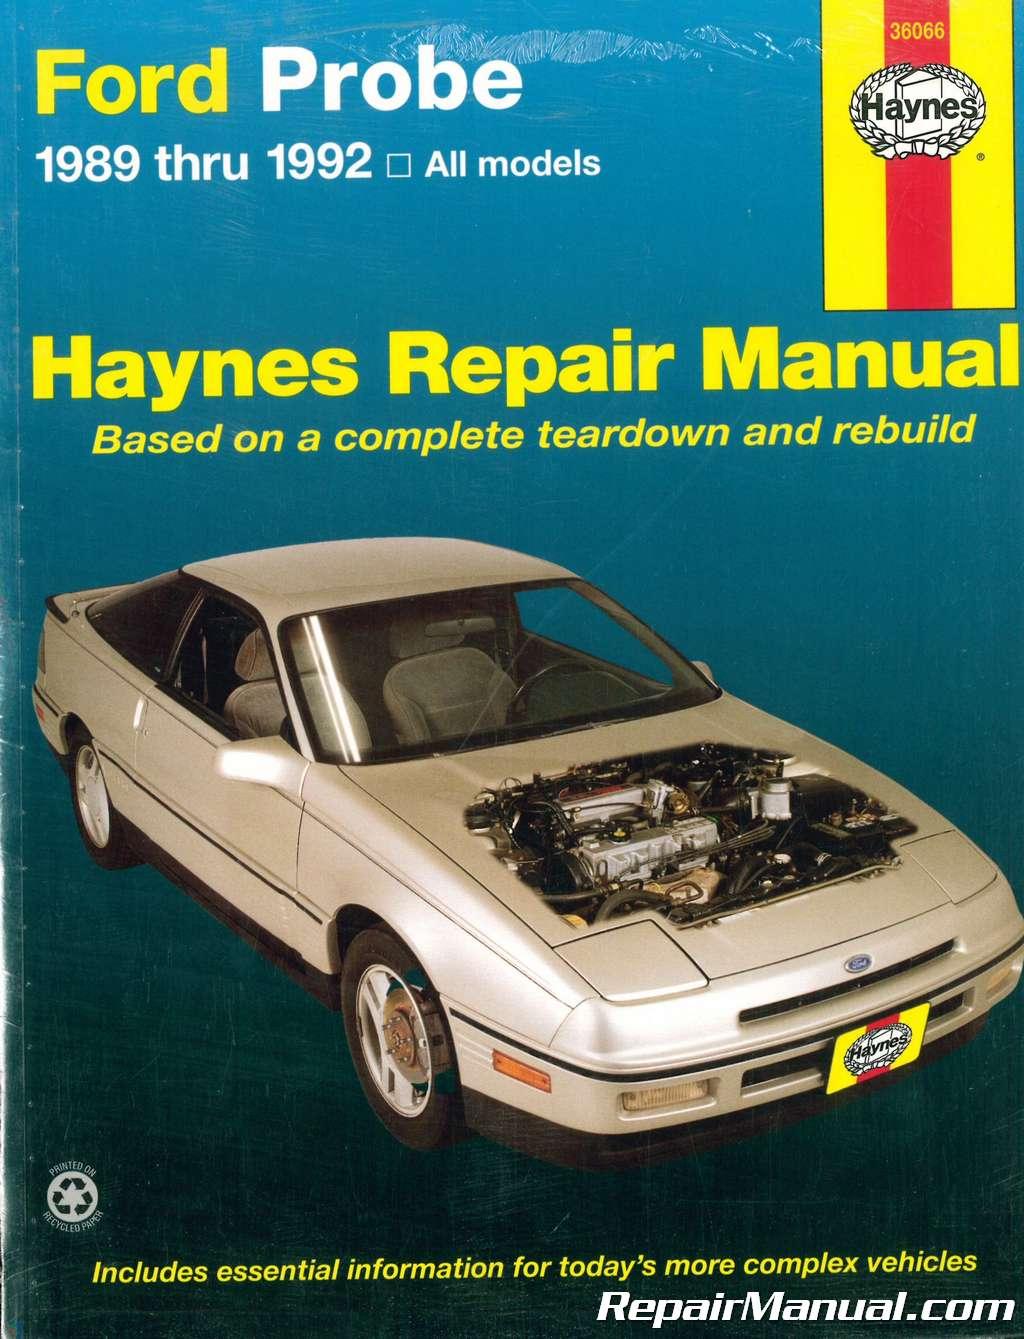 Tools & Equipment Automotive Haynes 36076 Technical Repair Manual ...